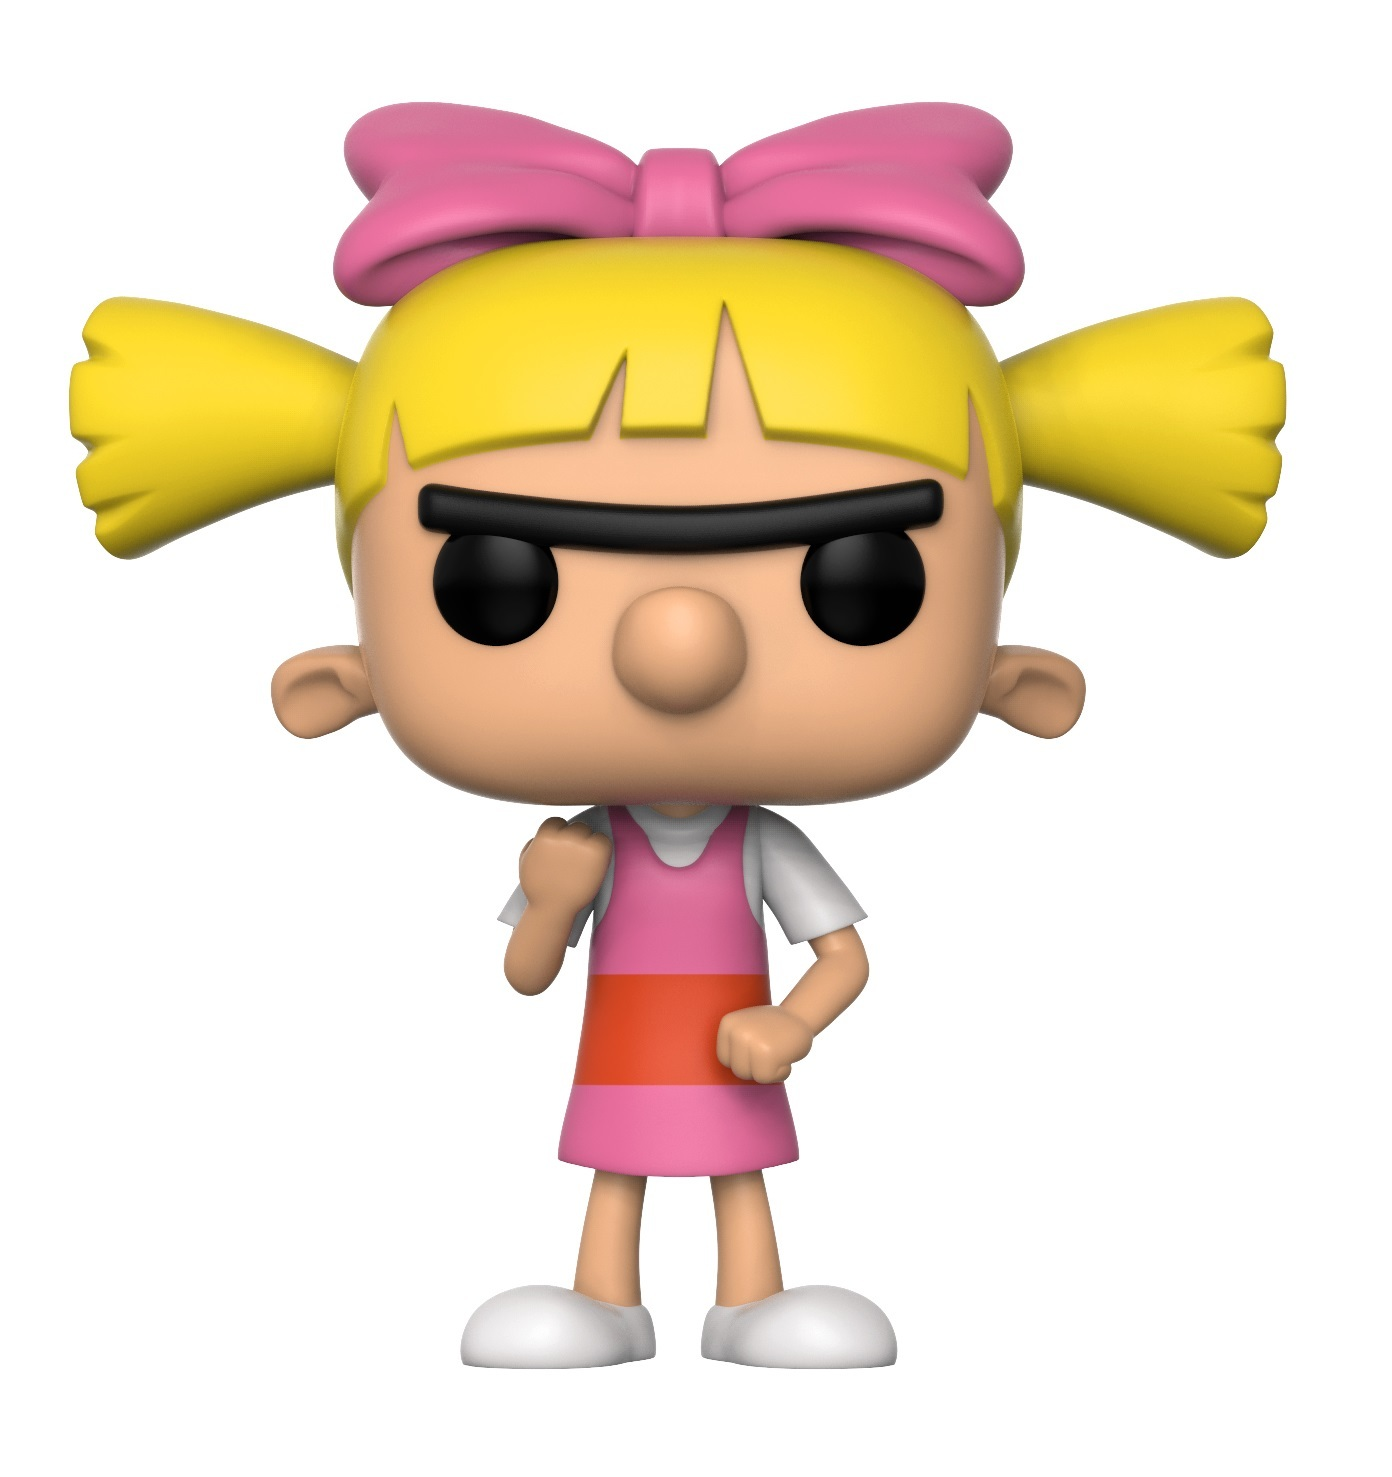 Hey Arnold - Helga Pataki Pop! Vinyl Figure image